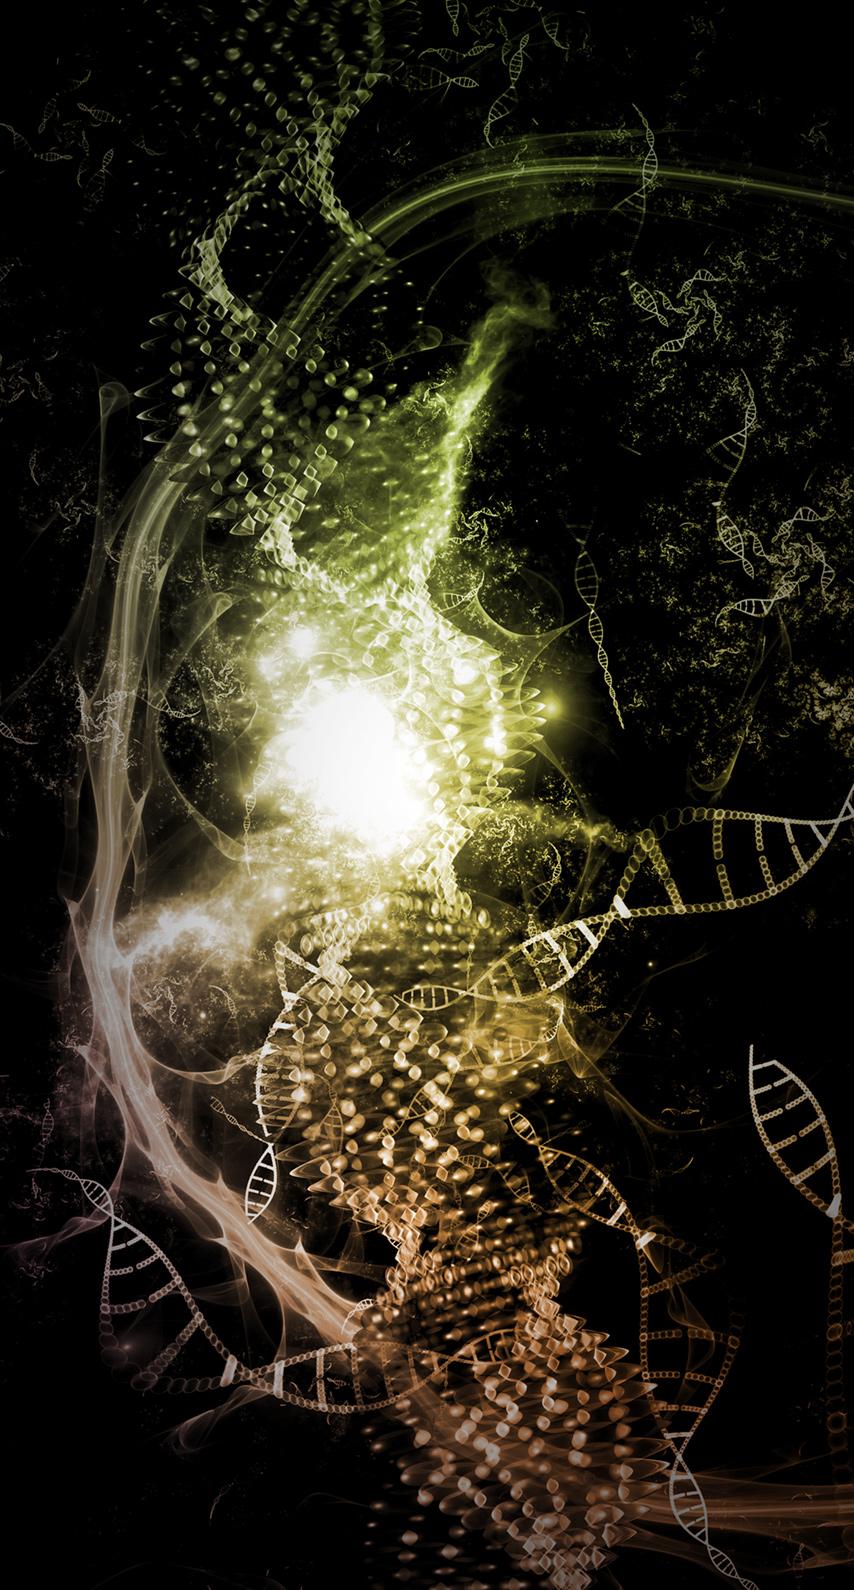 organism, lighting